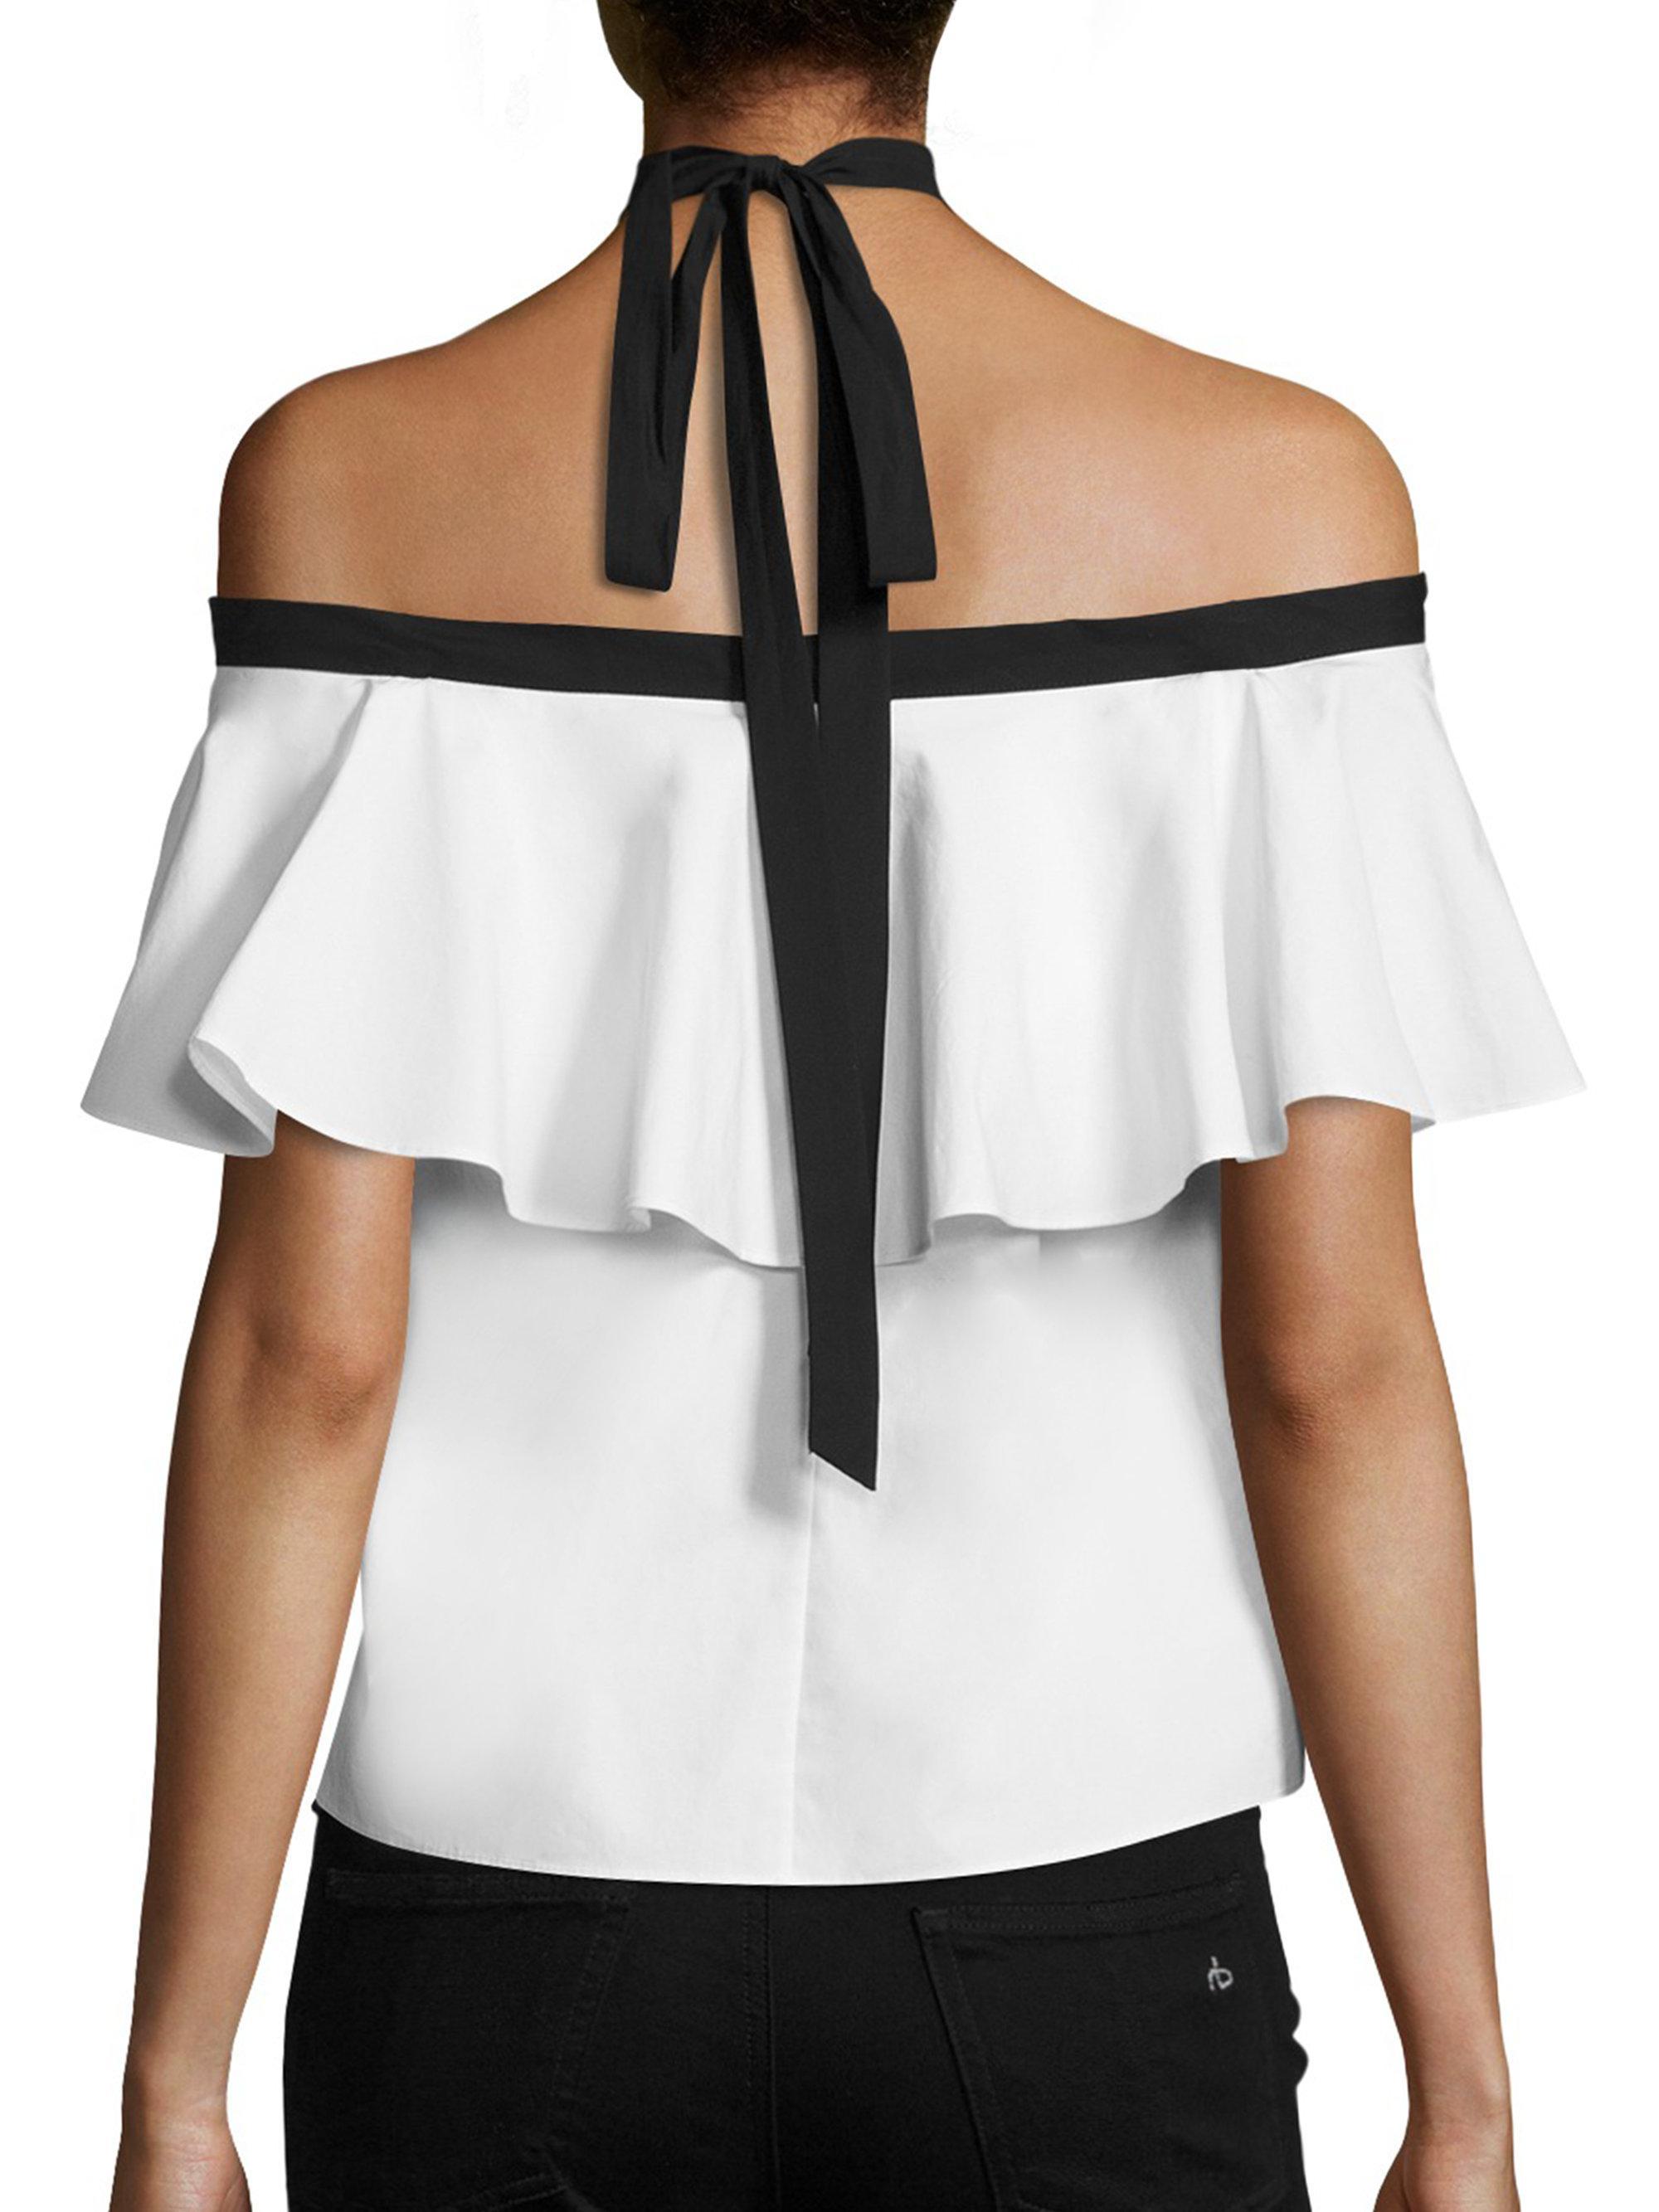 9a342091261279 Alice + Olivia Alyssa Off-the-shoulder Halter Top in White - Lyst